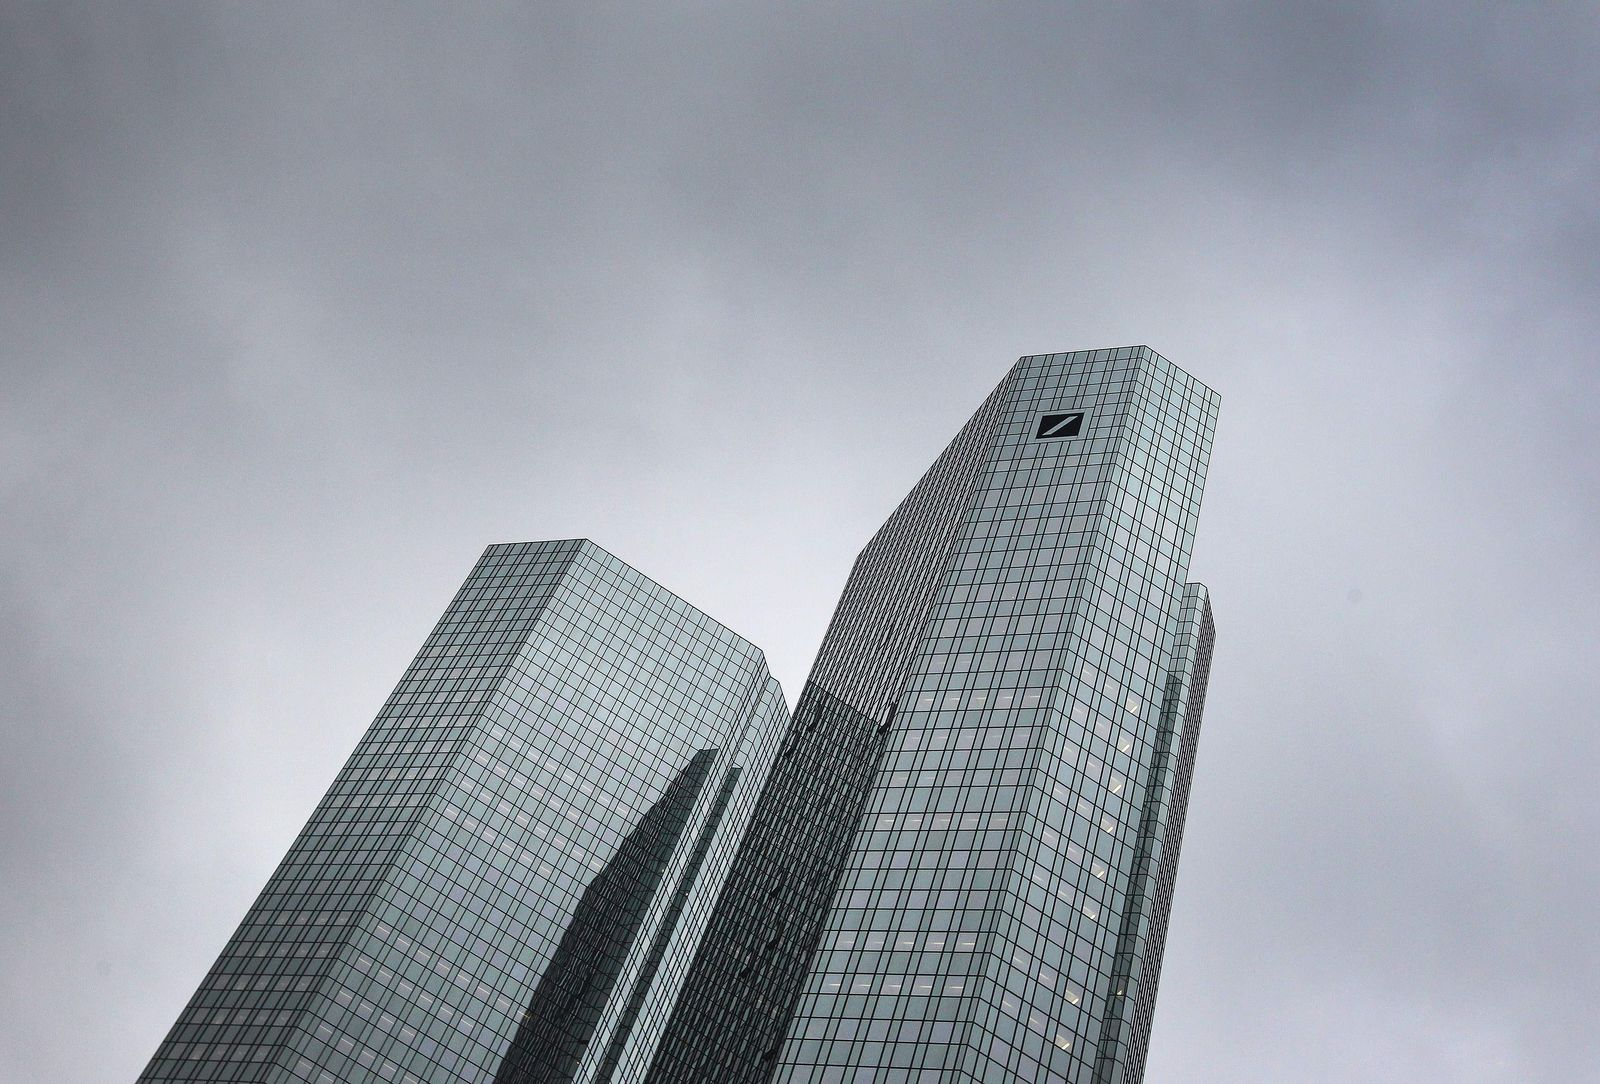 FILES-US-POLITICS-RUSSIA-INVESTIGATION-BANKS-GERMANY